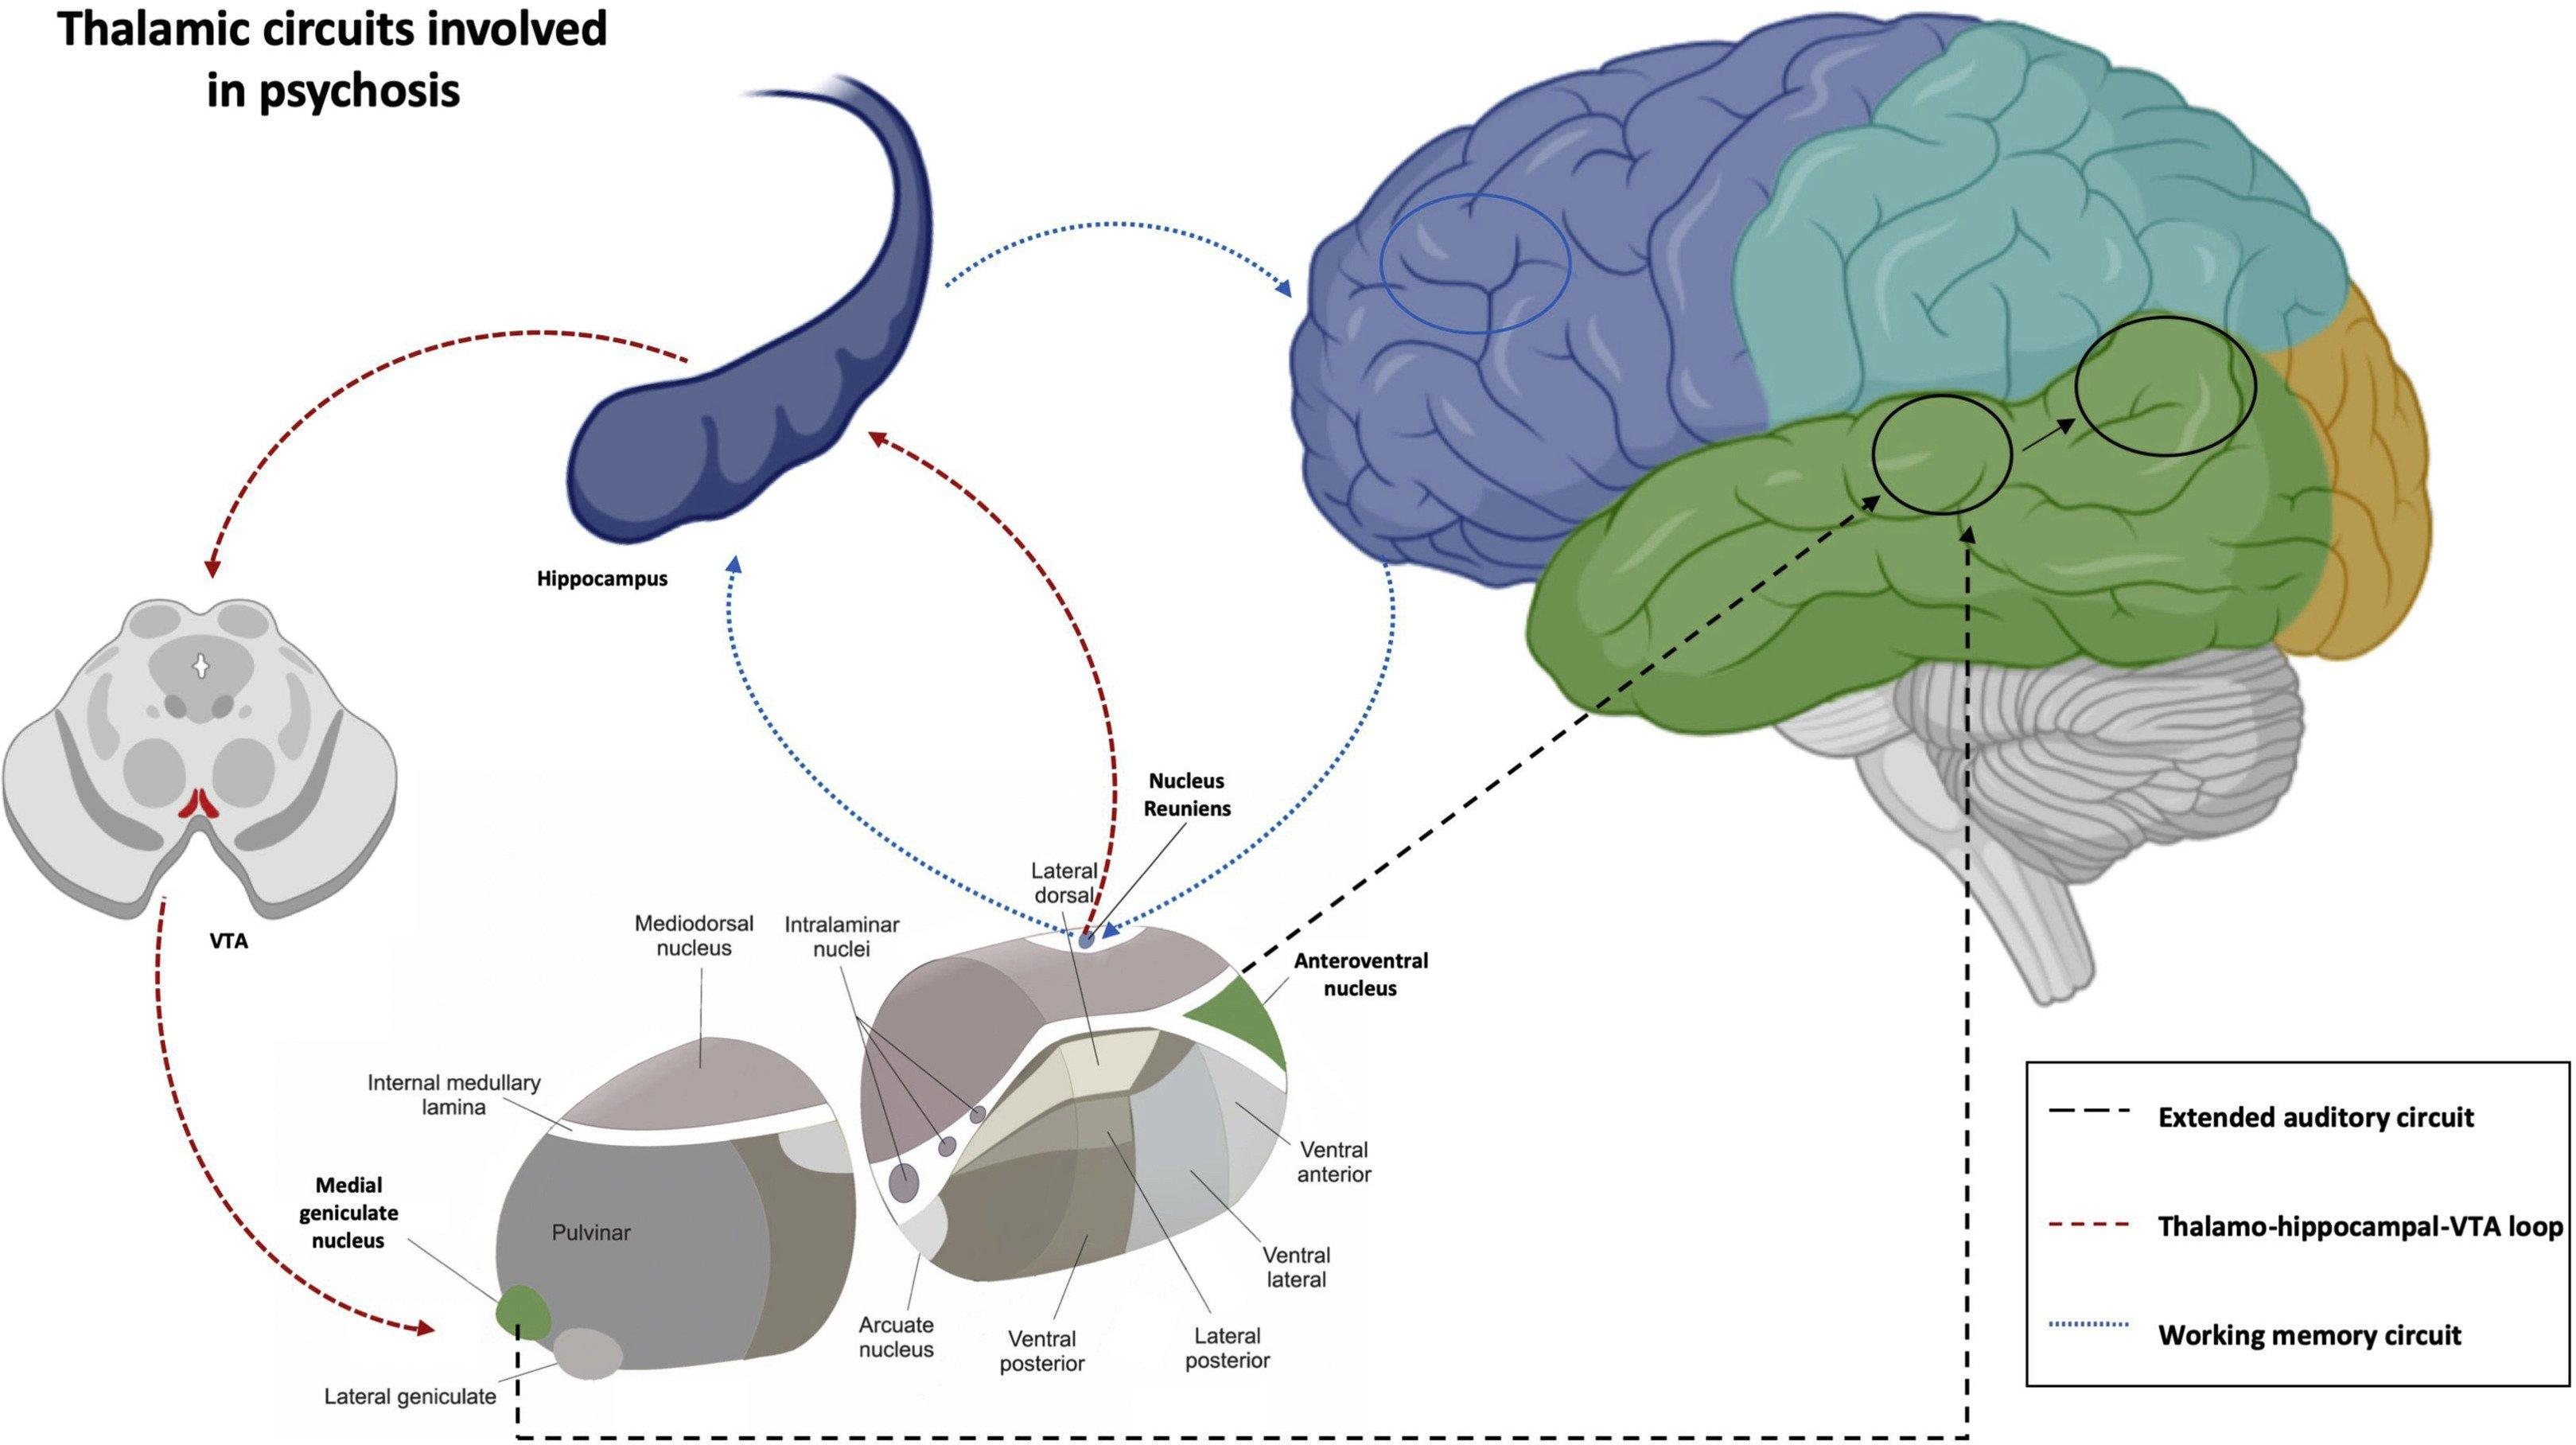 Шизофрения: «игра» таламуса со слухом